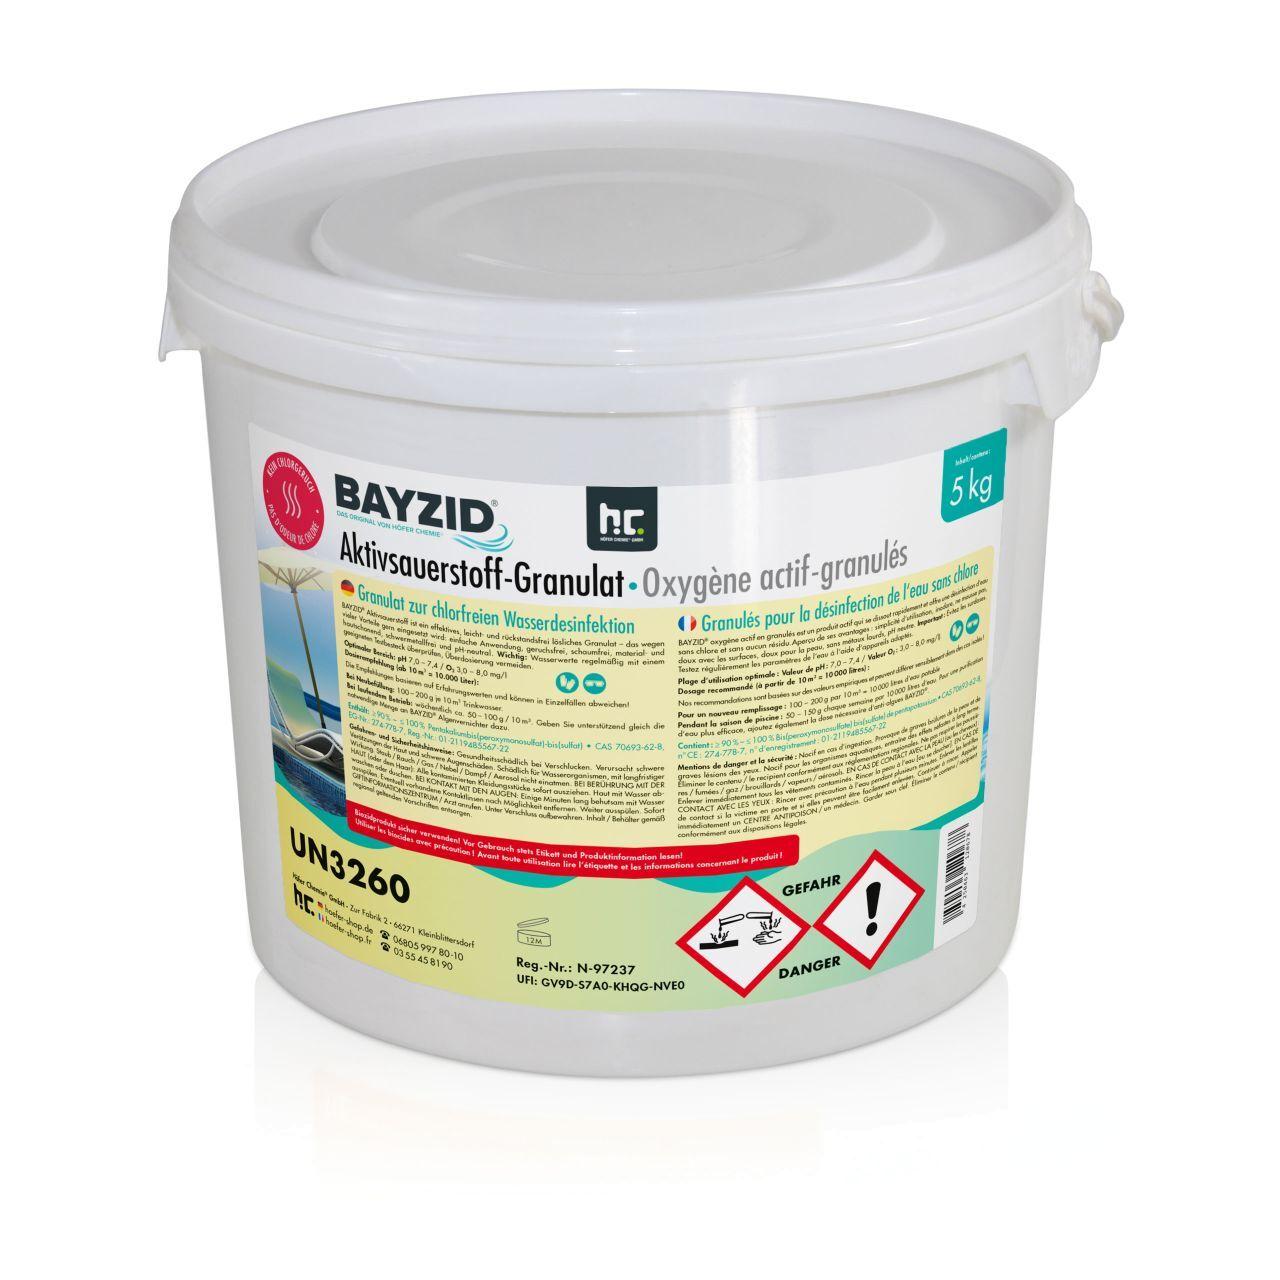 Höfer Chemie 5 kg BAYZID® Oxygène actif – granulés (1 x 5 kg)